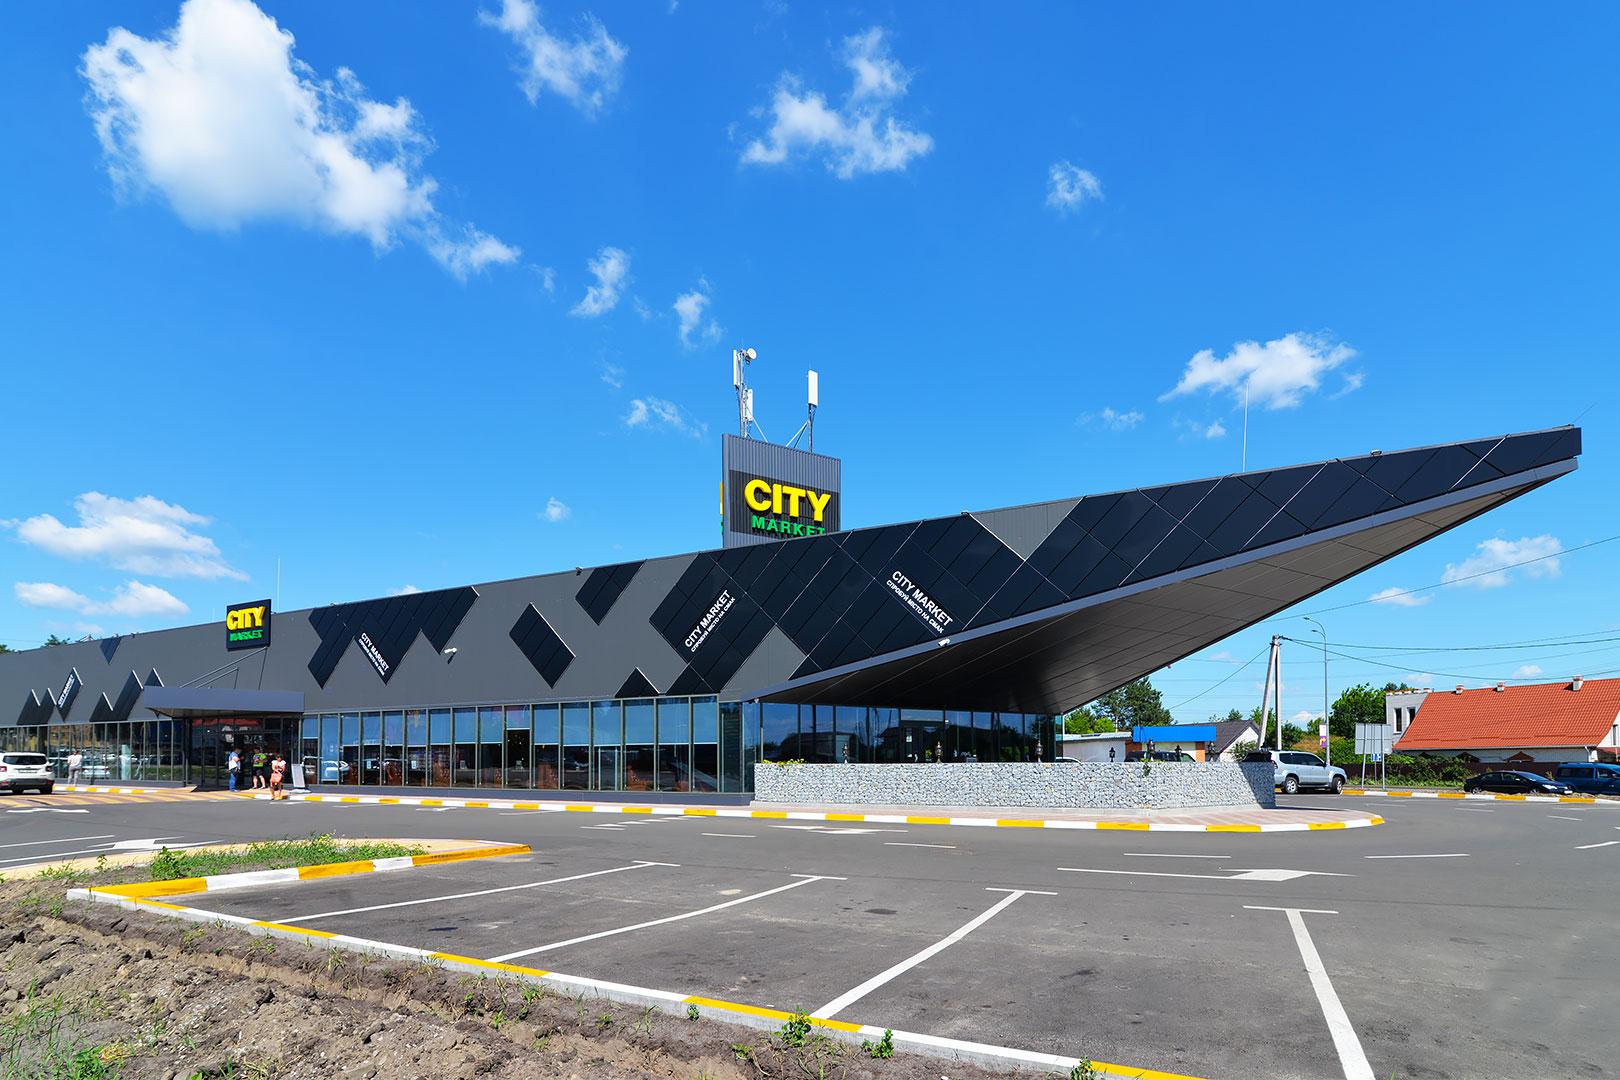 Supermarket City Market